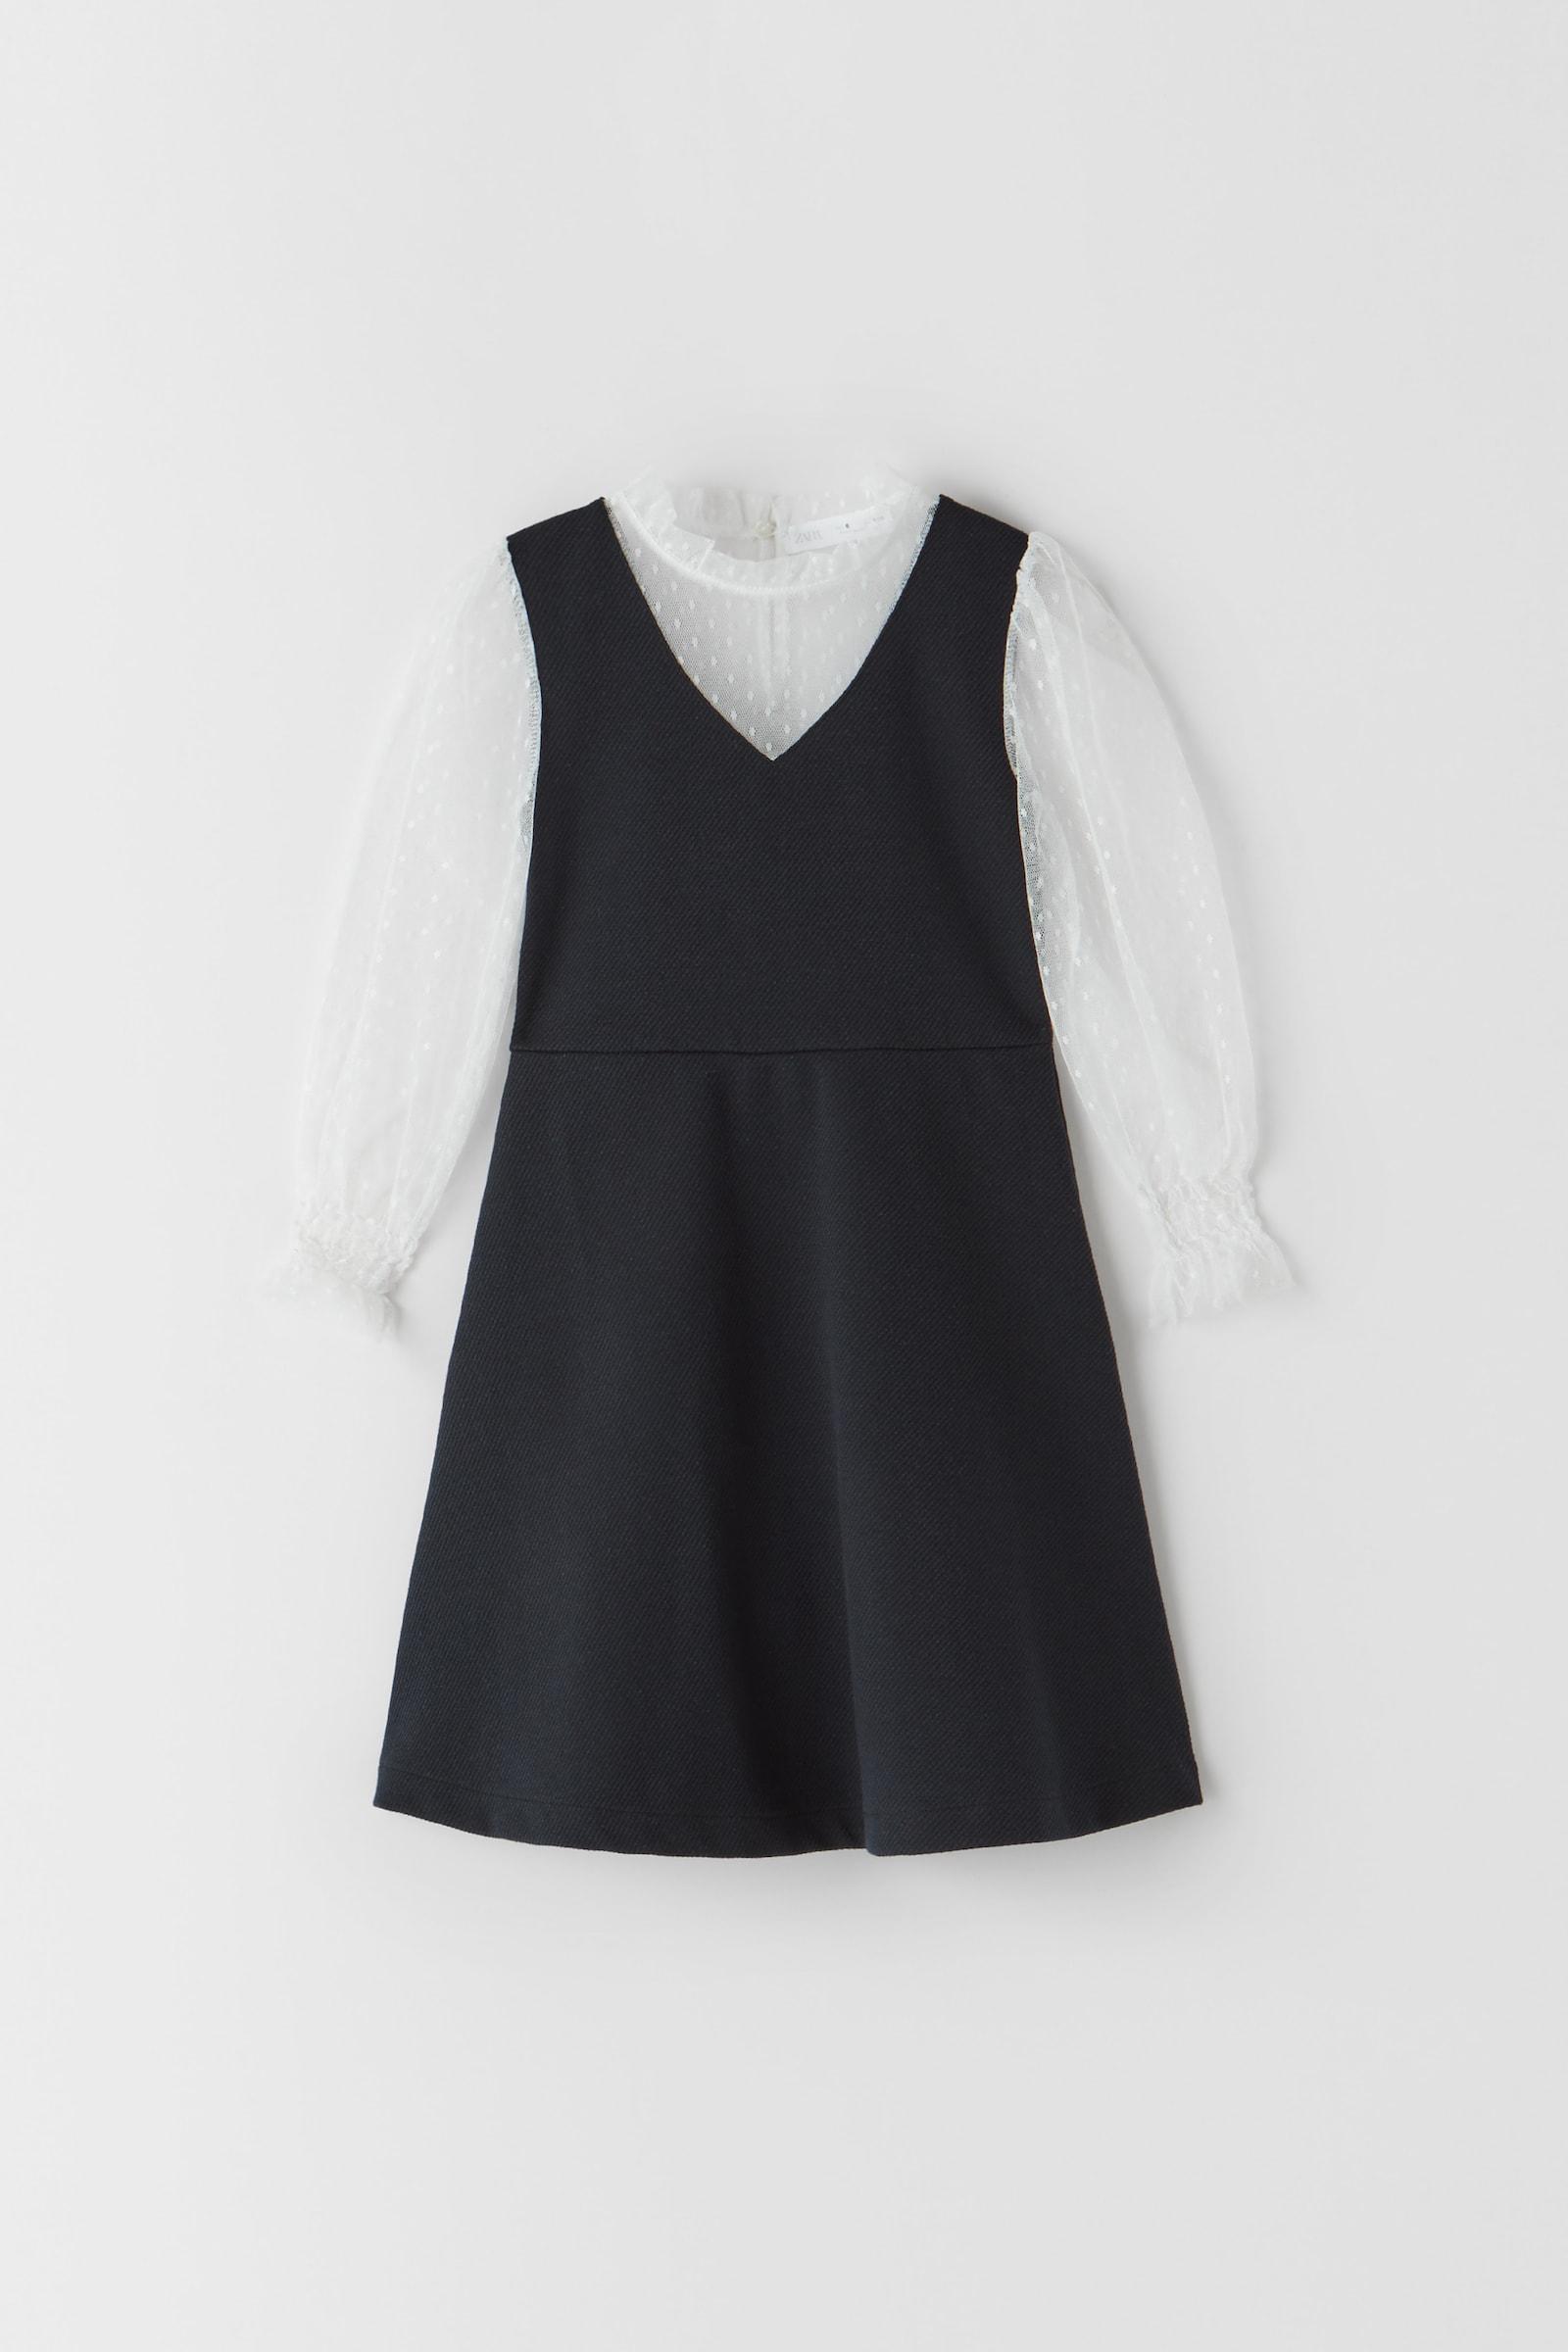 zara kids ceremon style fashion trend 2021 fast fashion